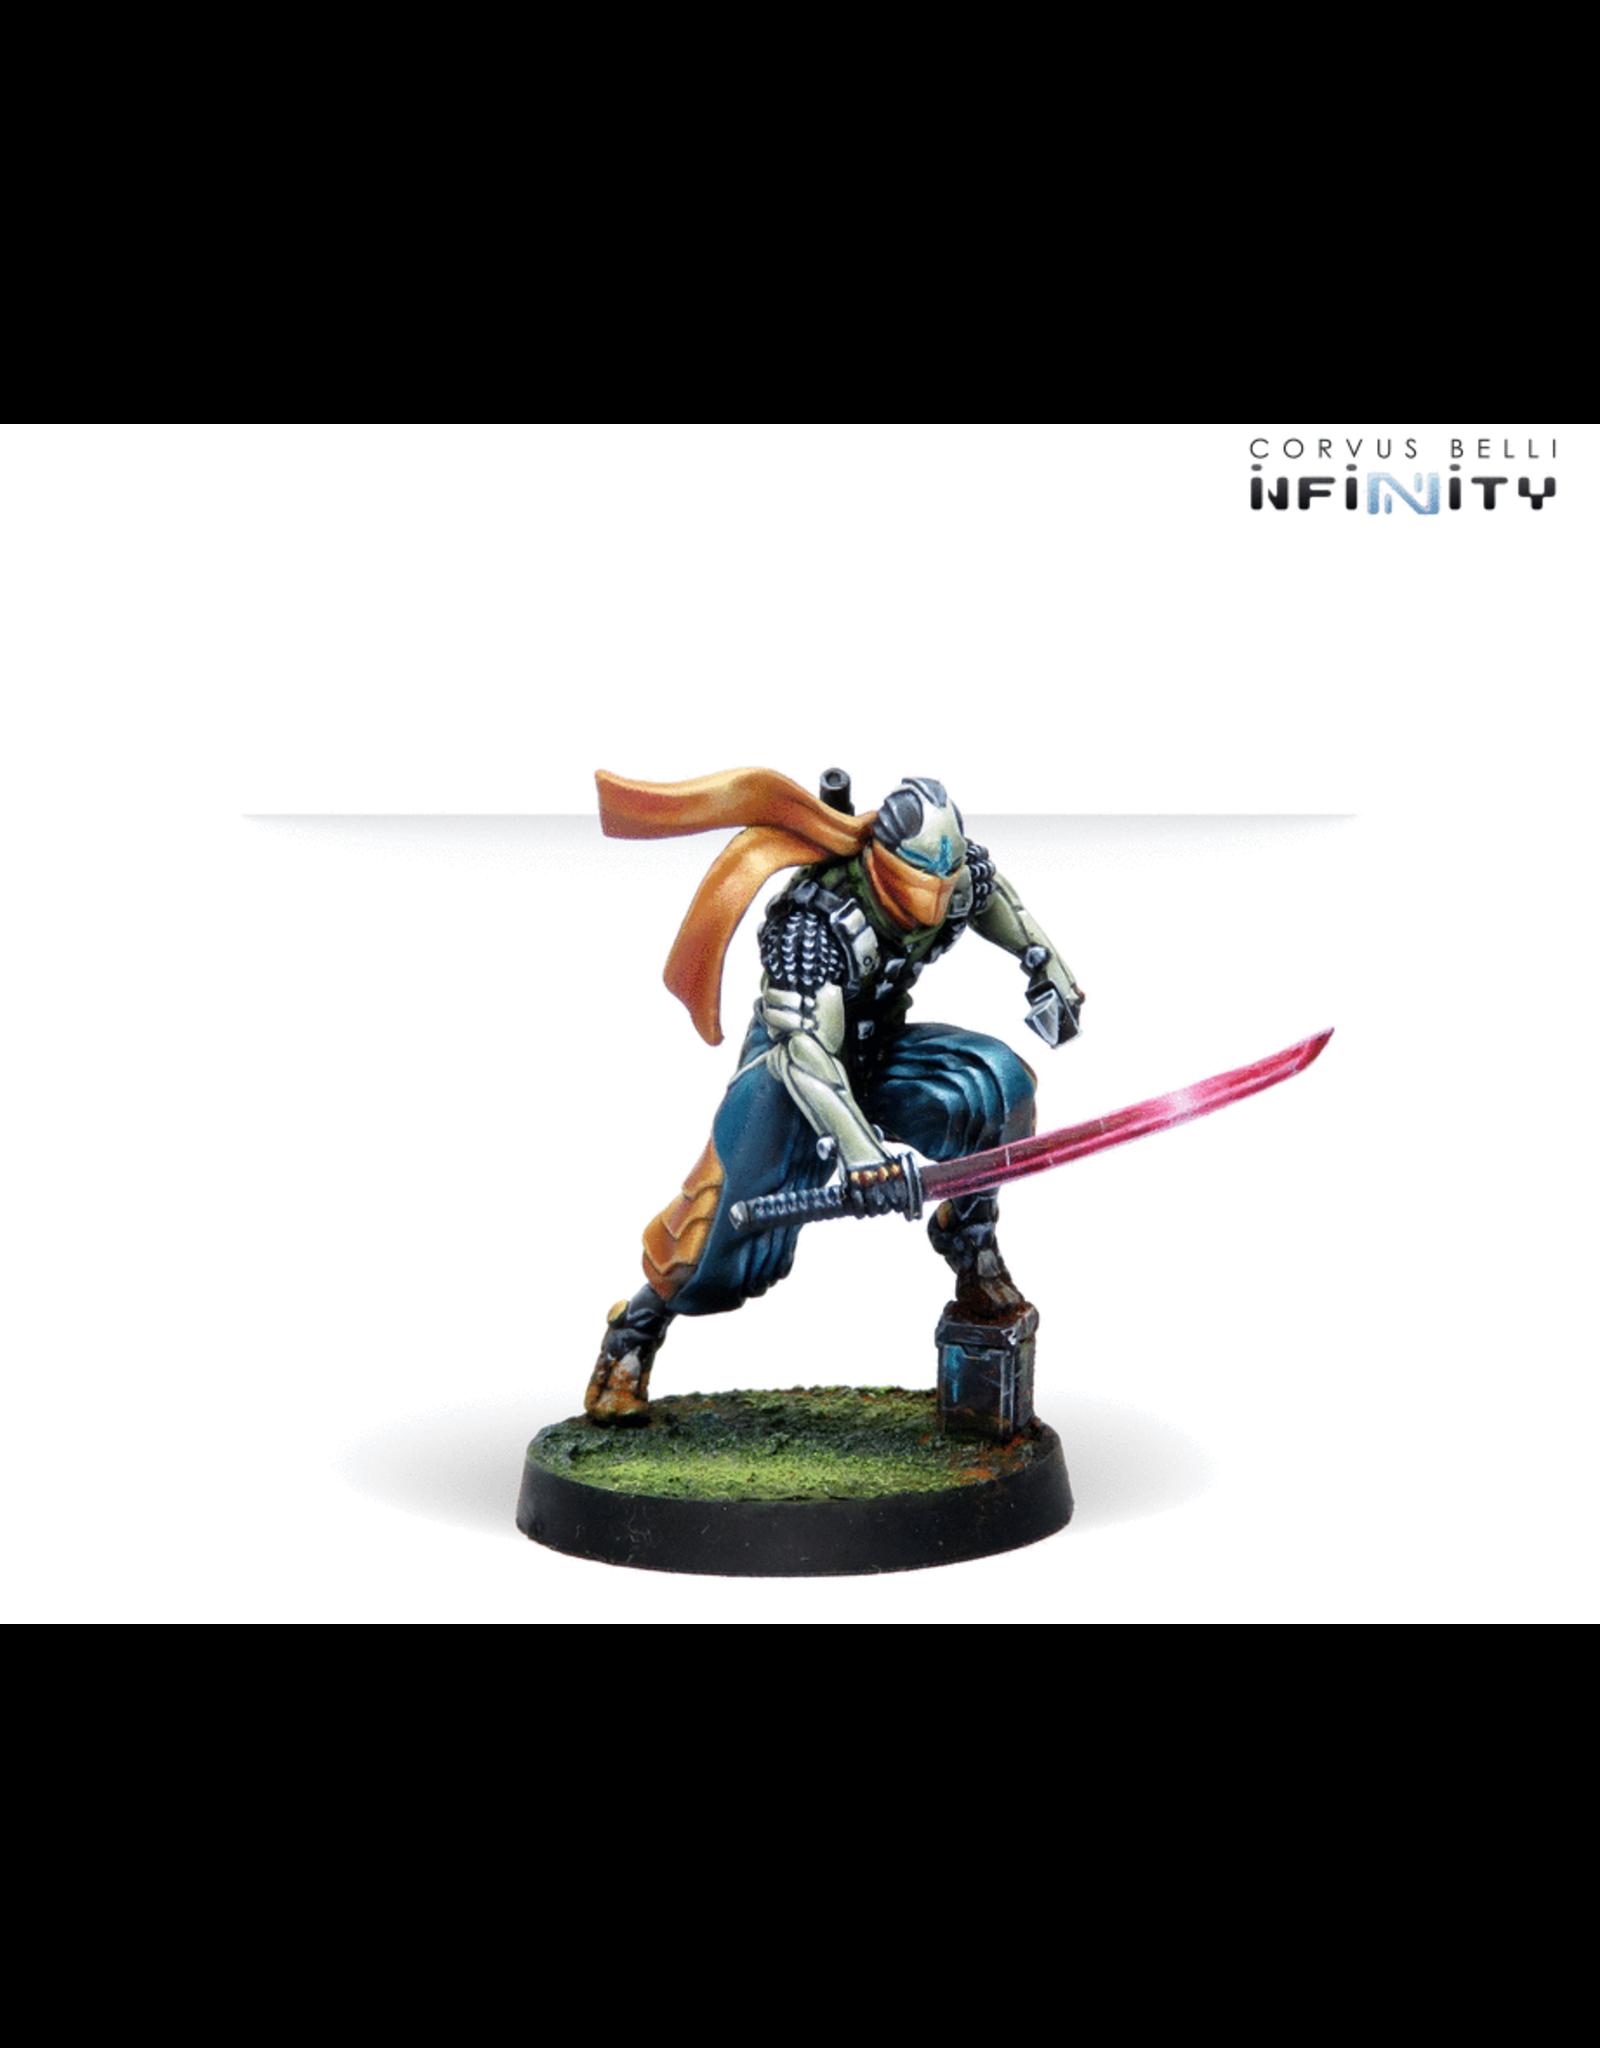 Corvus Belli Infinity: Saito Togan, Mercenary Ninja